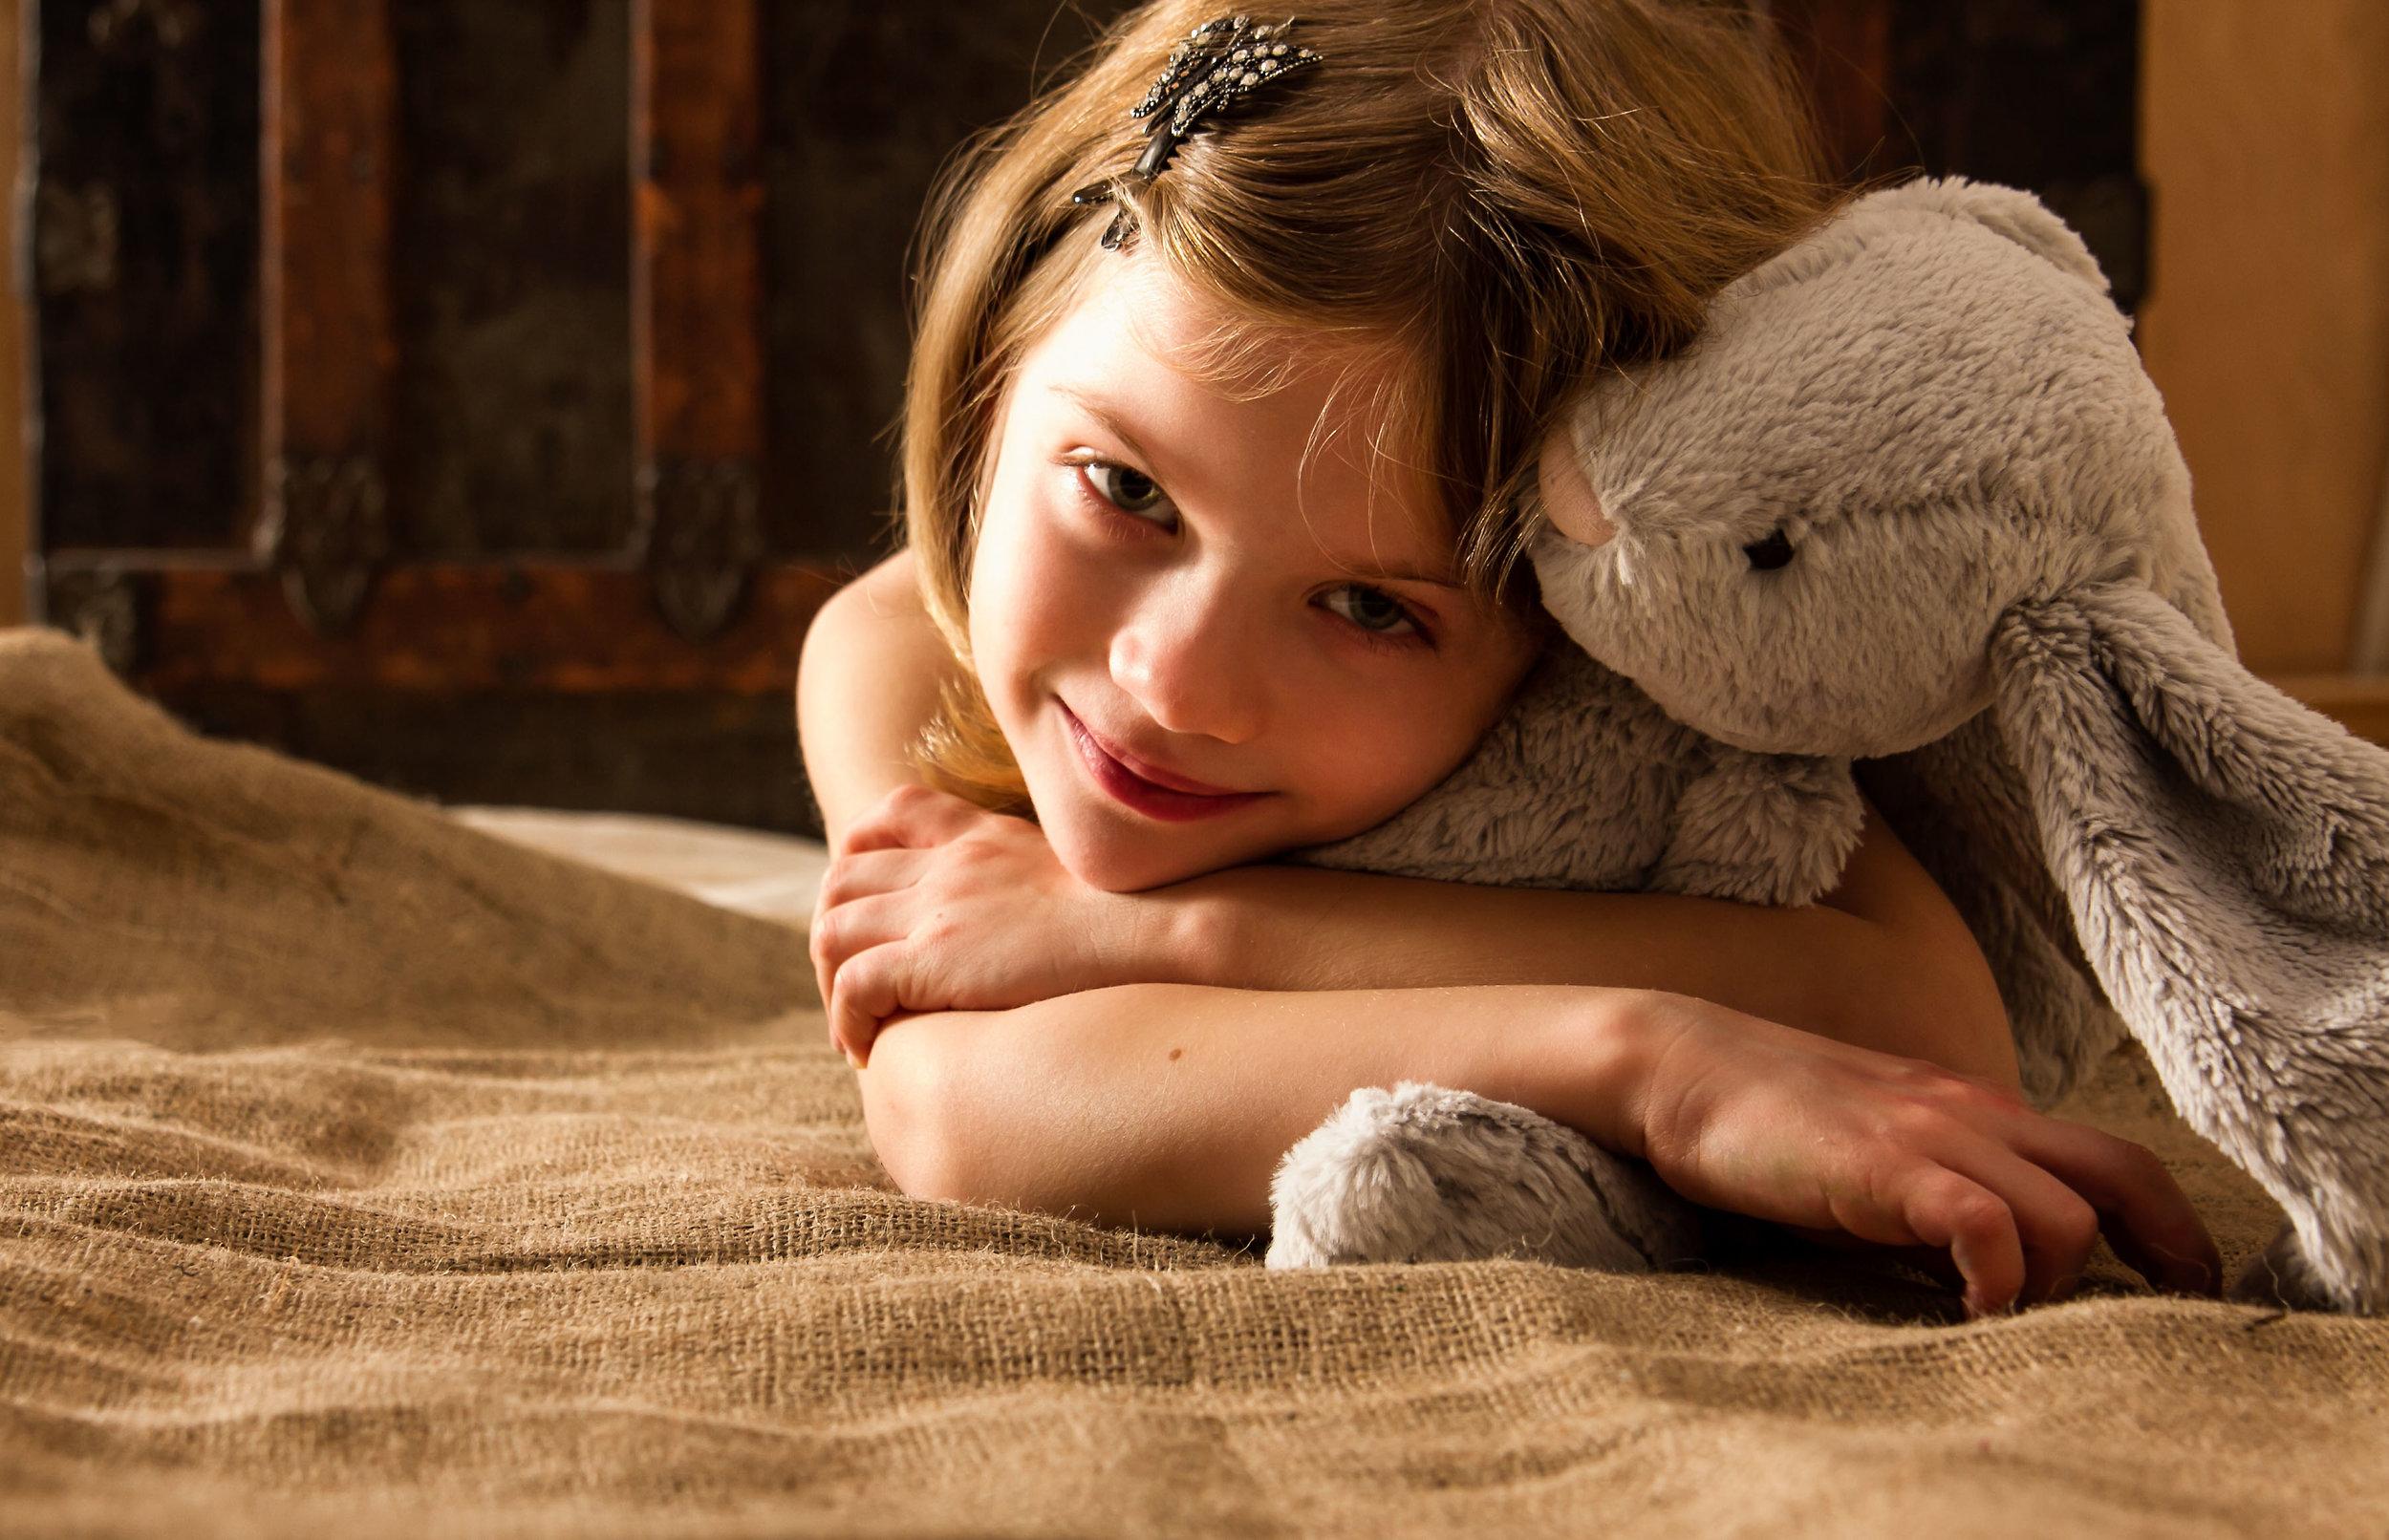 Little Girl with Bunny.jpg